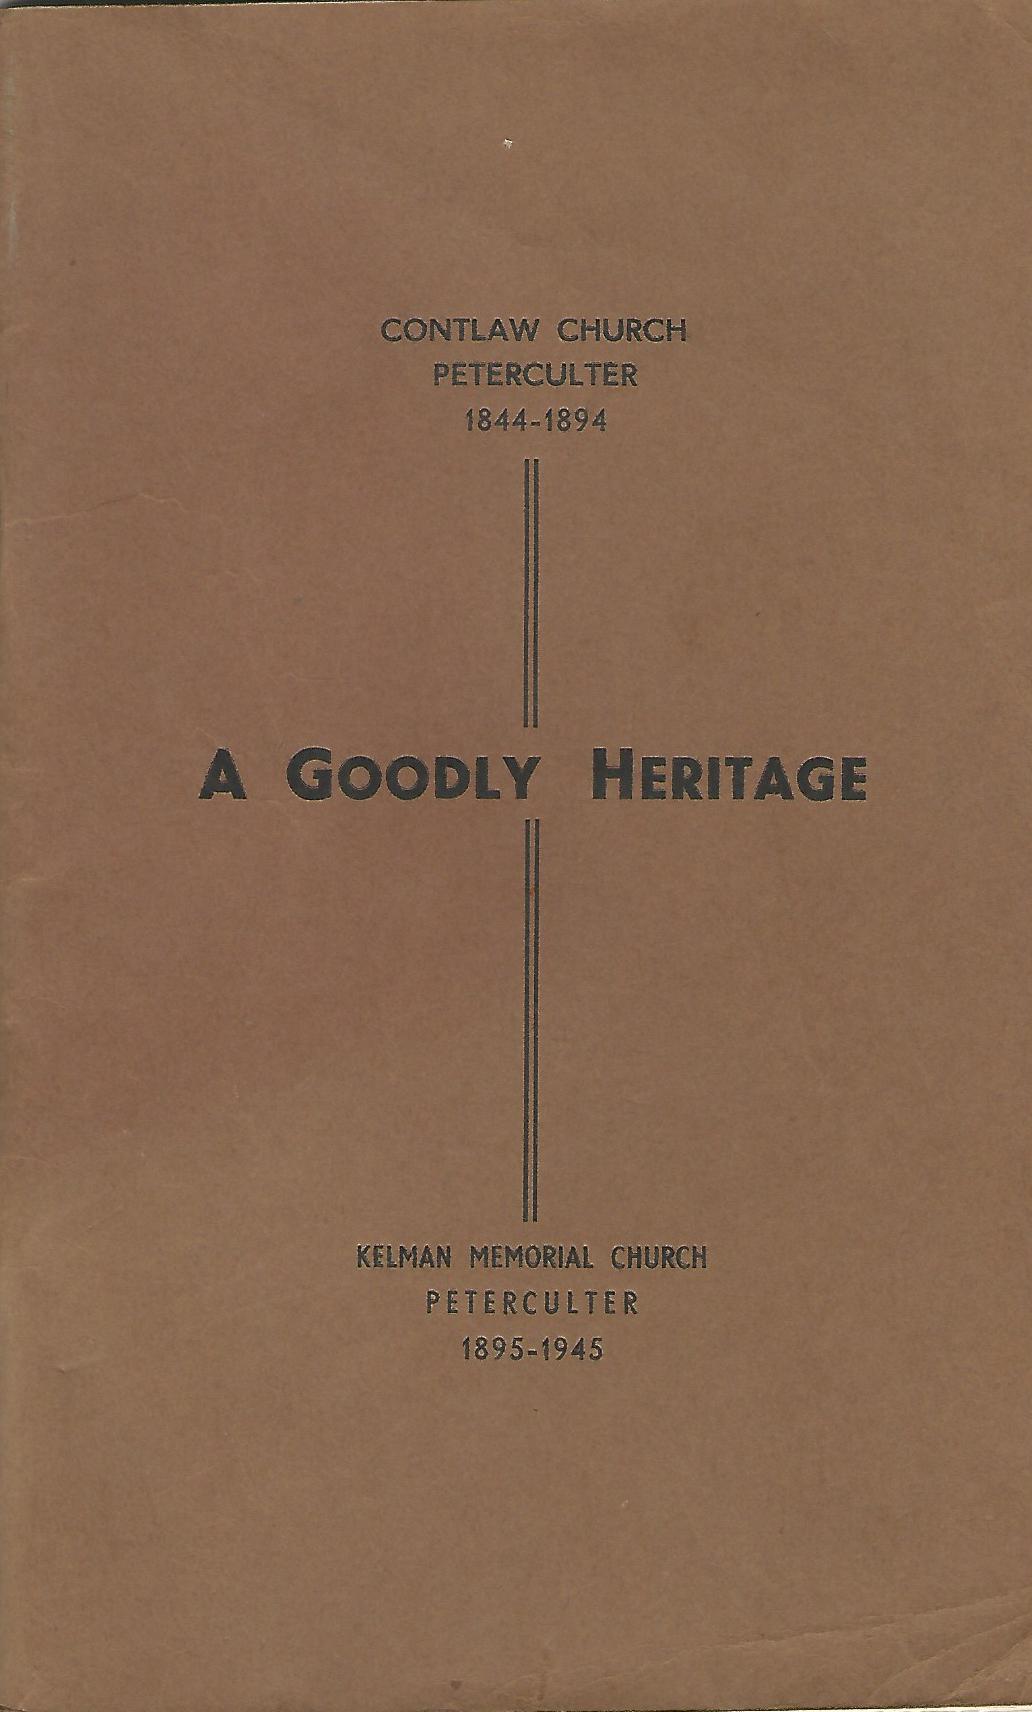 A Goodly Heritage: The Story of 100 years, Contlaw Church, Peterculter 1844-1894, Kelman Memorial Church, Peteculter 1895-1945.